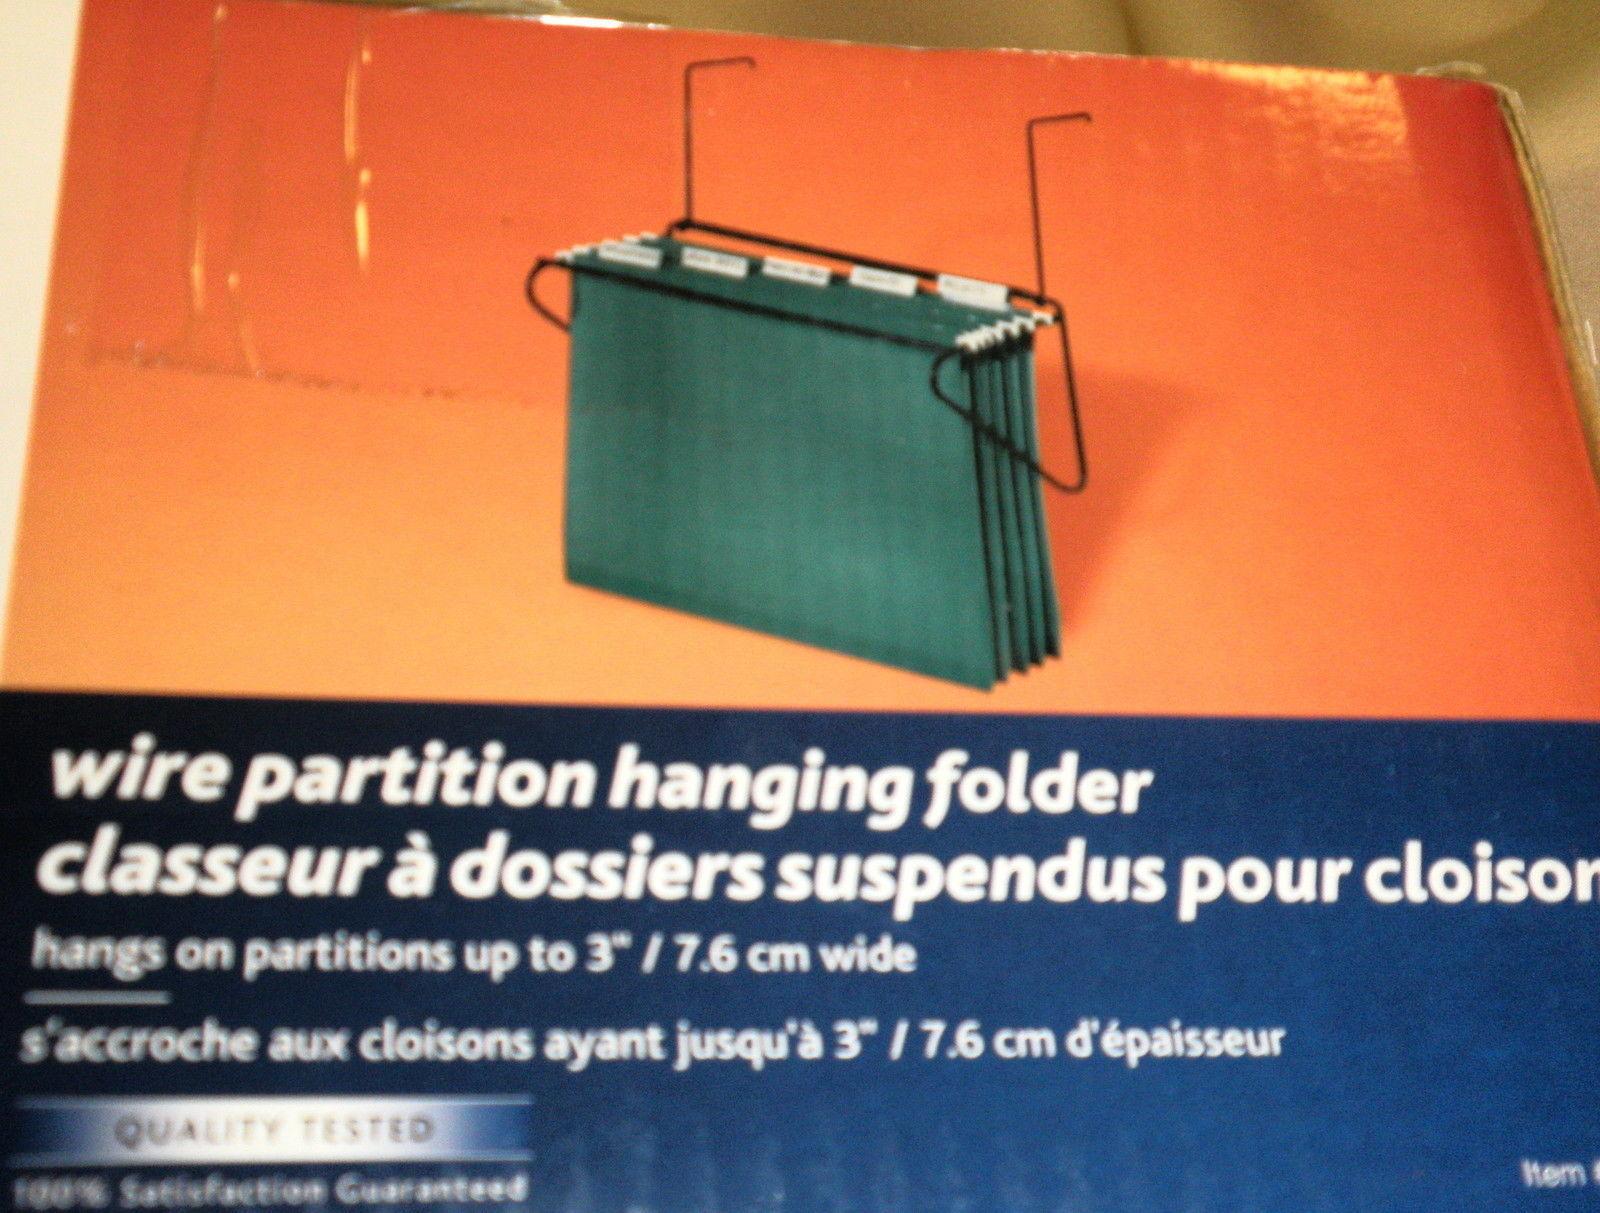 Office Depot Black Wire Partition Hanging Folder #580-902